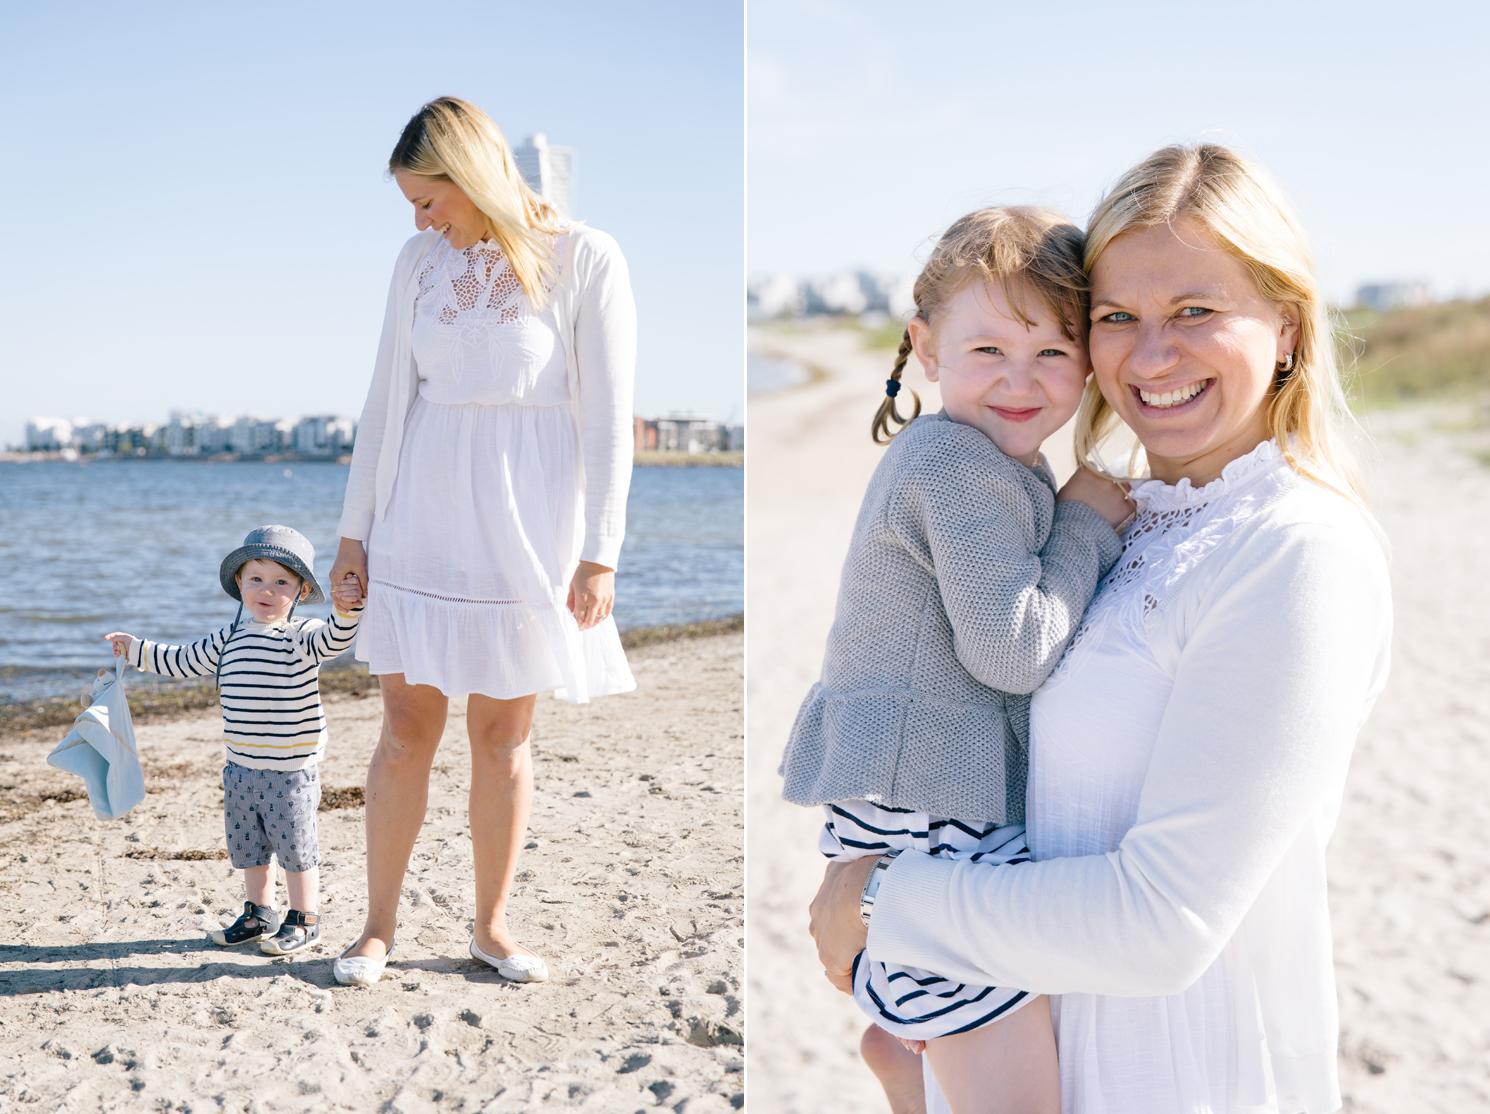 familjefotografering-malmo-kallbadhuset-maria-o-photo-lek-gladje-karlek-8